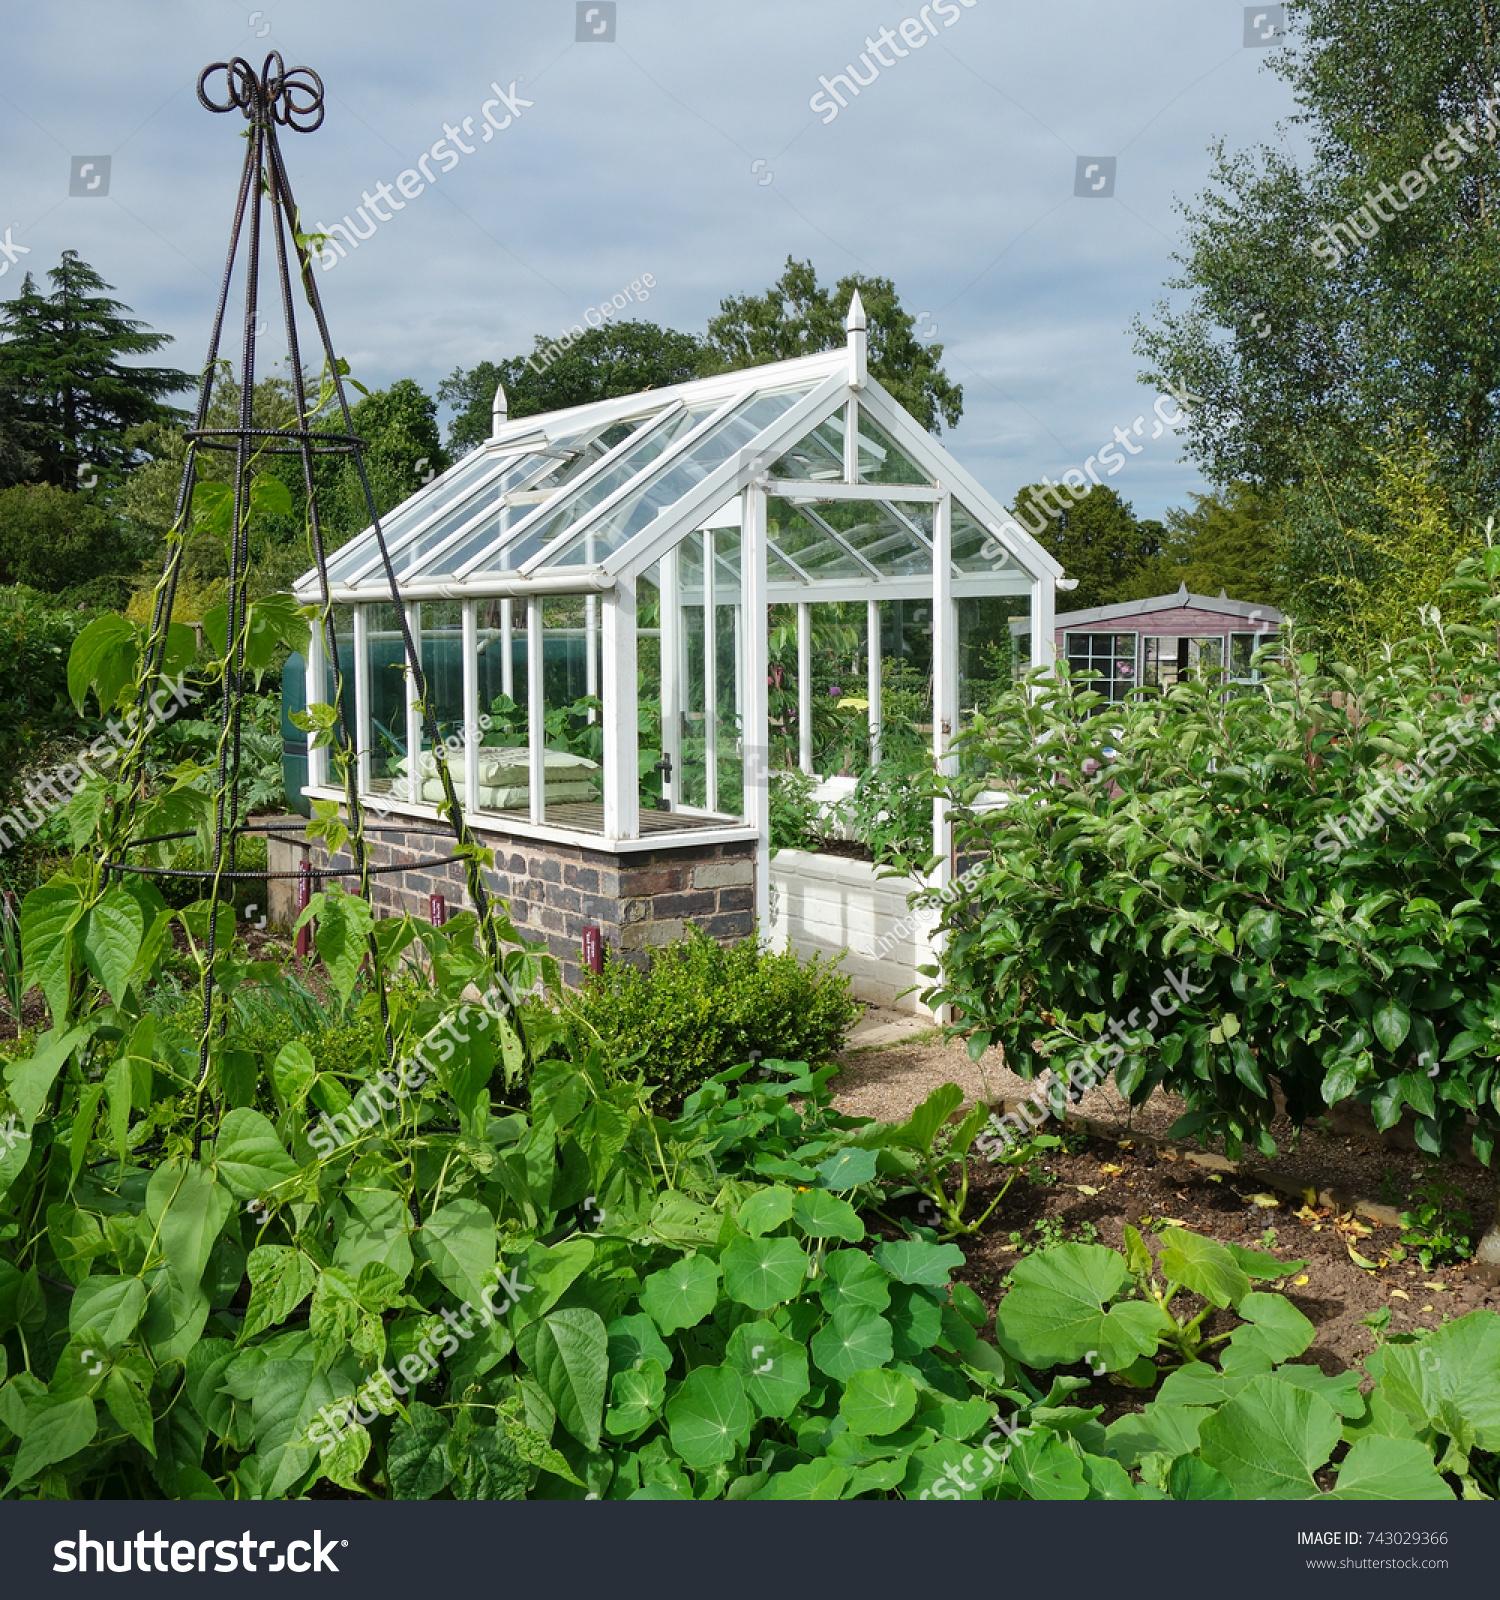 Greenhouse In English Vegetable Garden